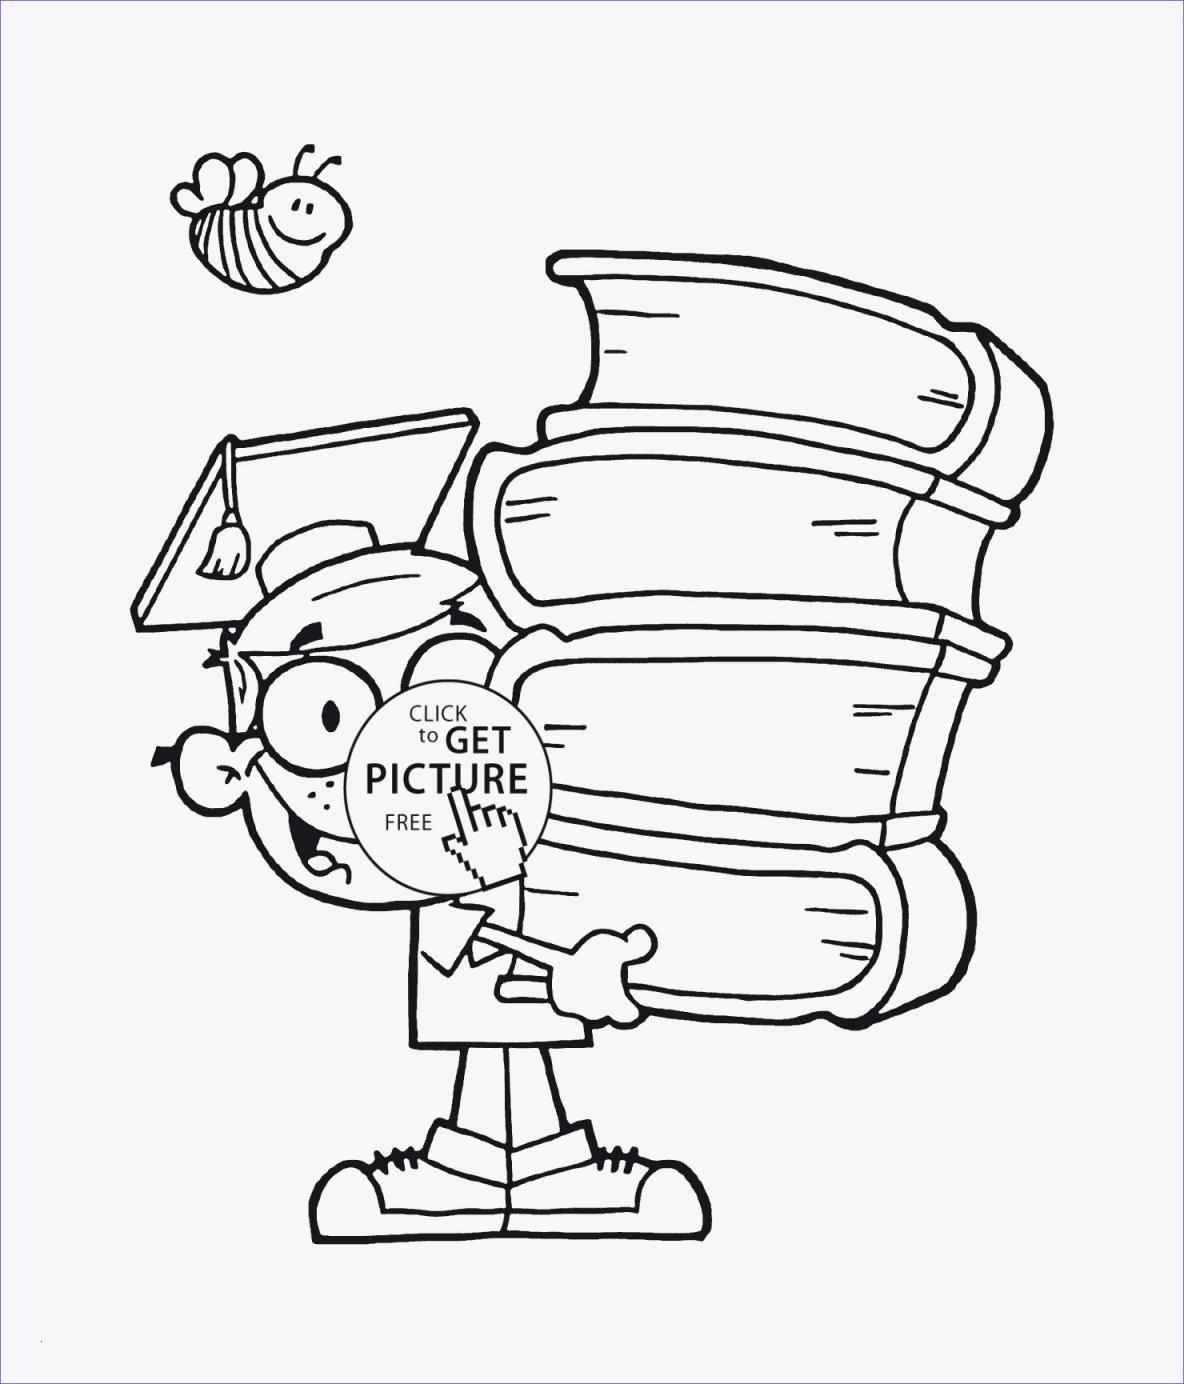 Ausmalbilder Donald Duck Neu Spinne Ausmalbild – Ausmalbilder Für Kinder Ausmalbilder Einzigartig Galerie